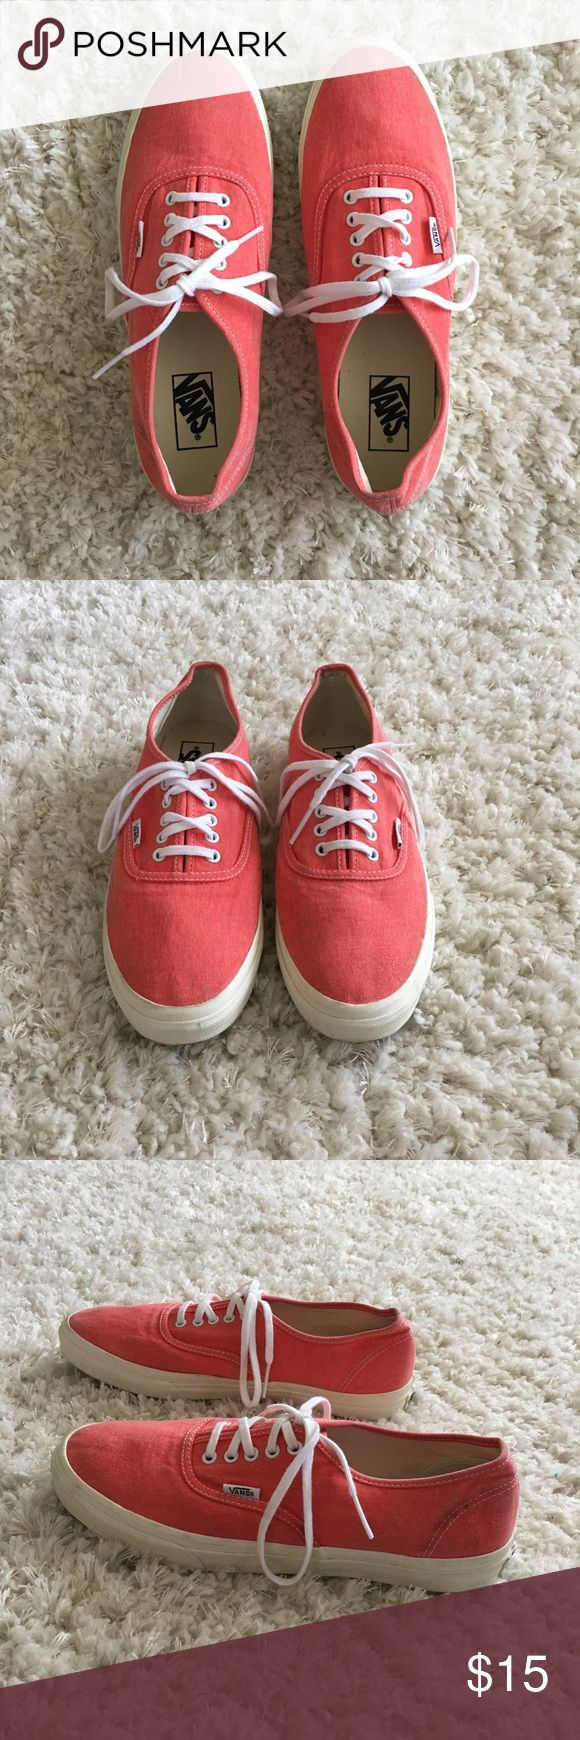 Coral Vans Women's Coral Vans, worn only a few times, size 11 Vans Shoes Sneakers